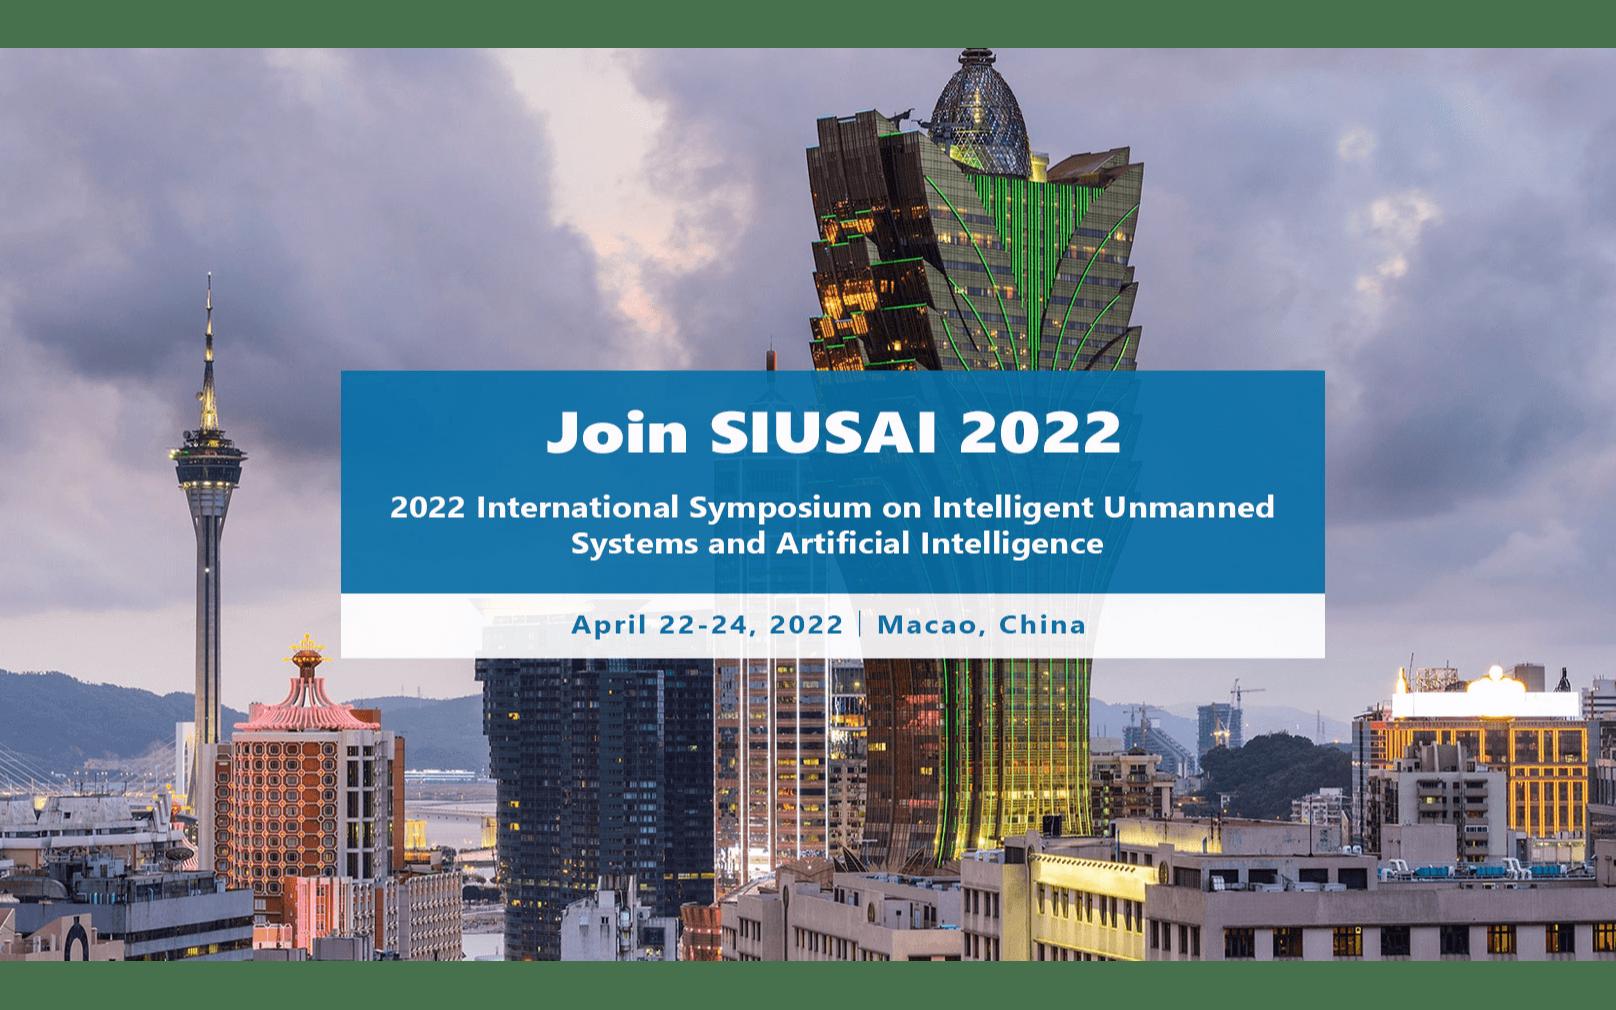 【EI检索】2022年智能无人系统与人工智能国际会议(SIUSAI 2022)